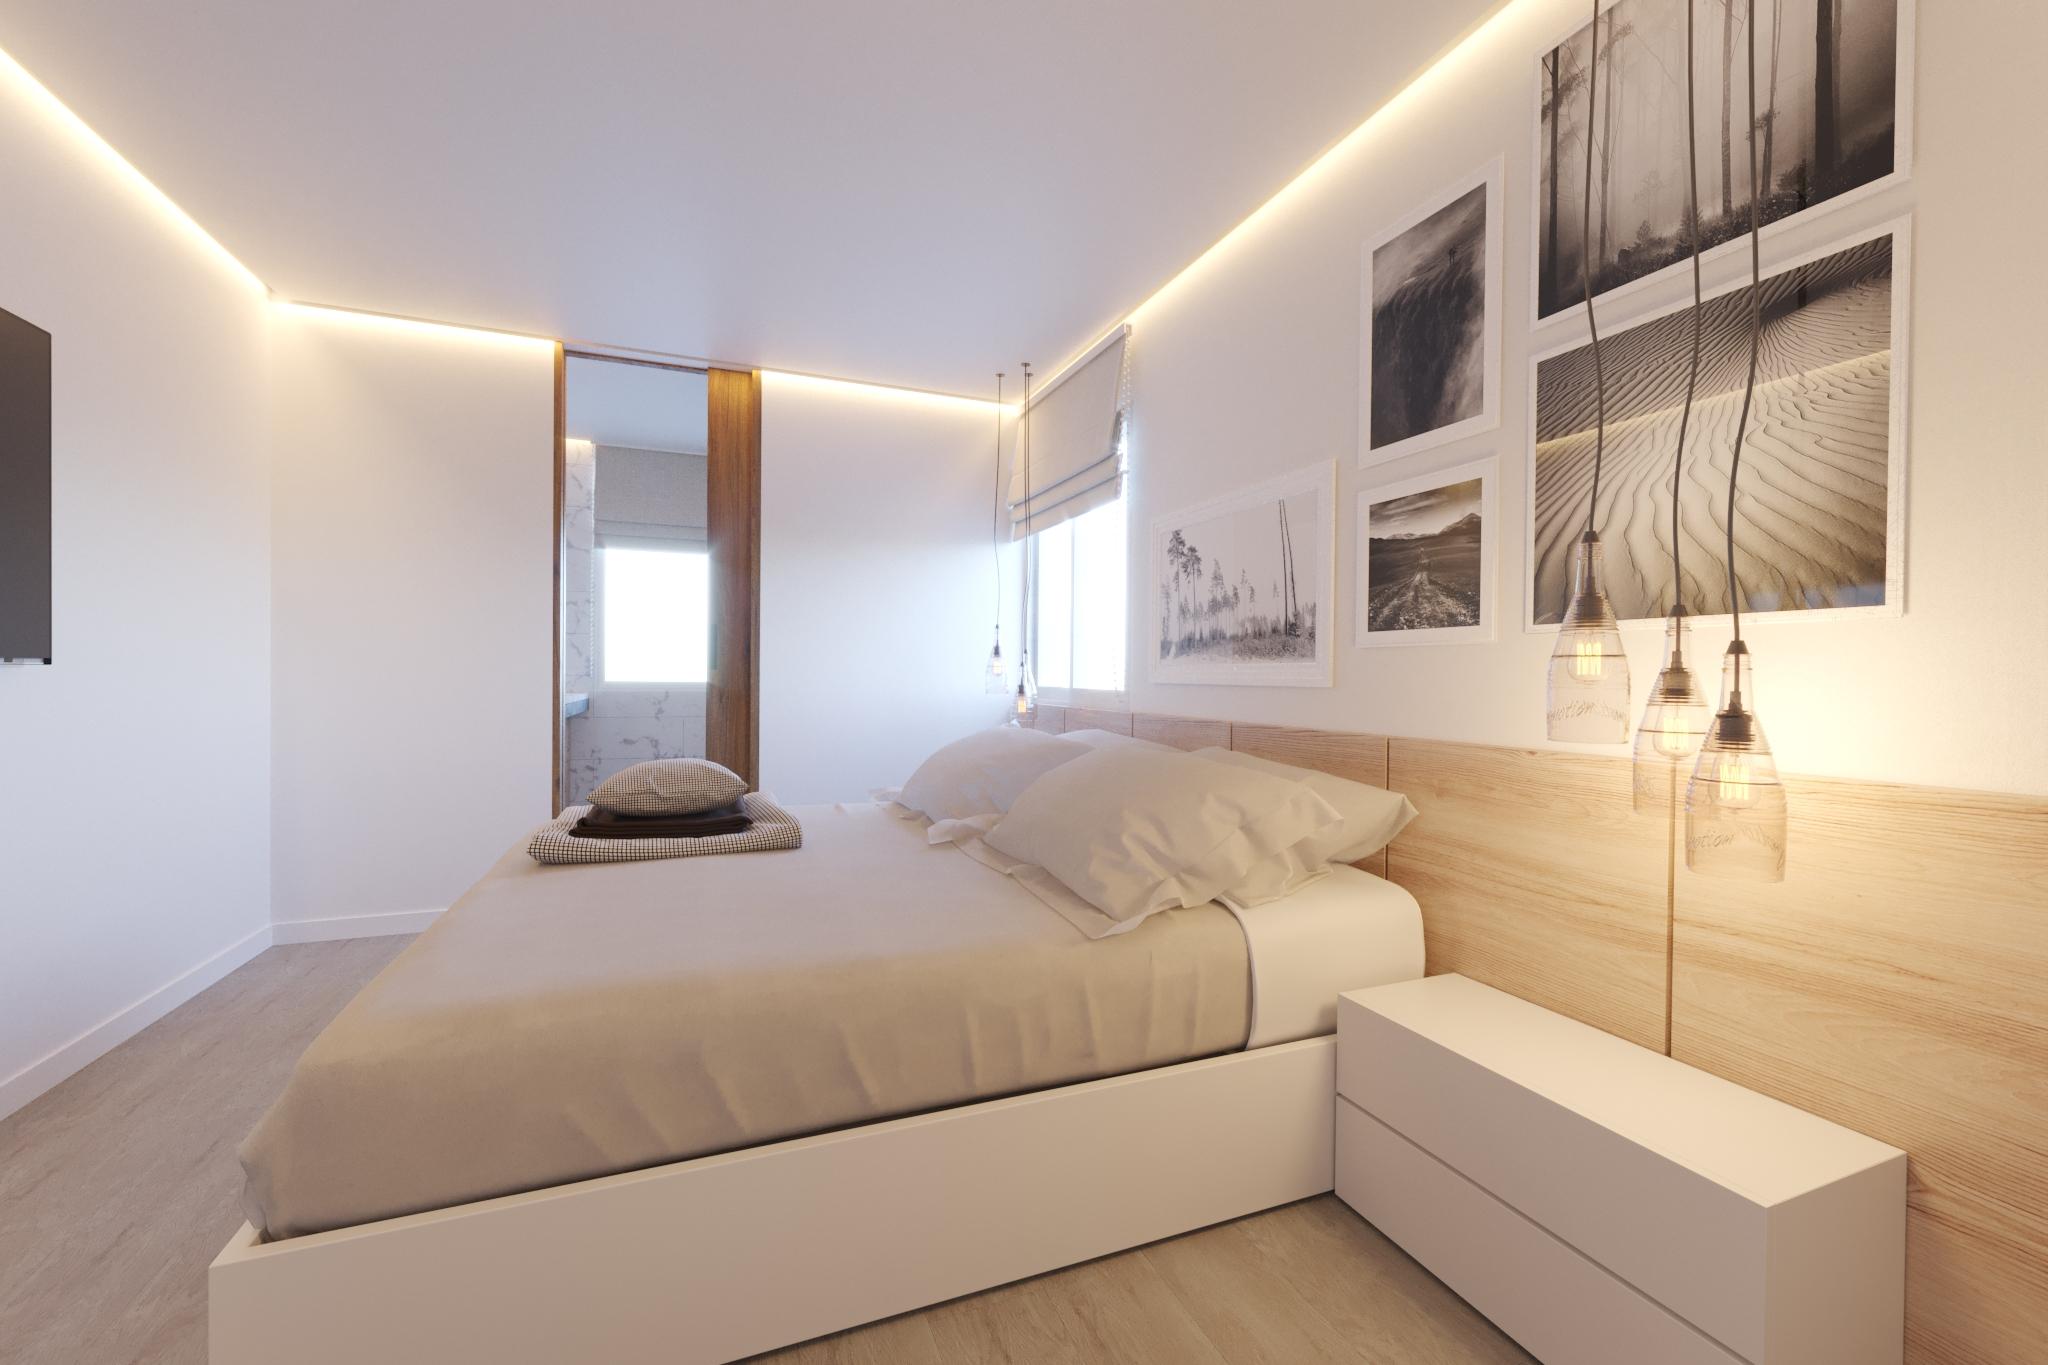 005-Dormitorio